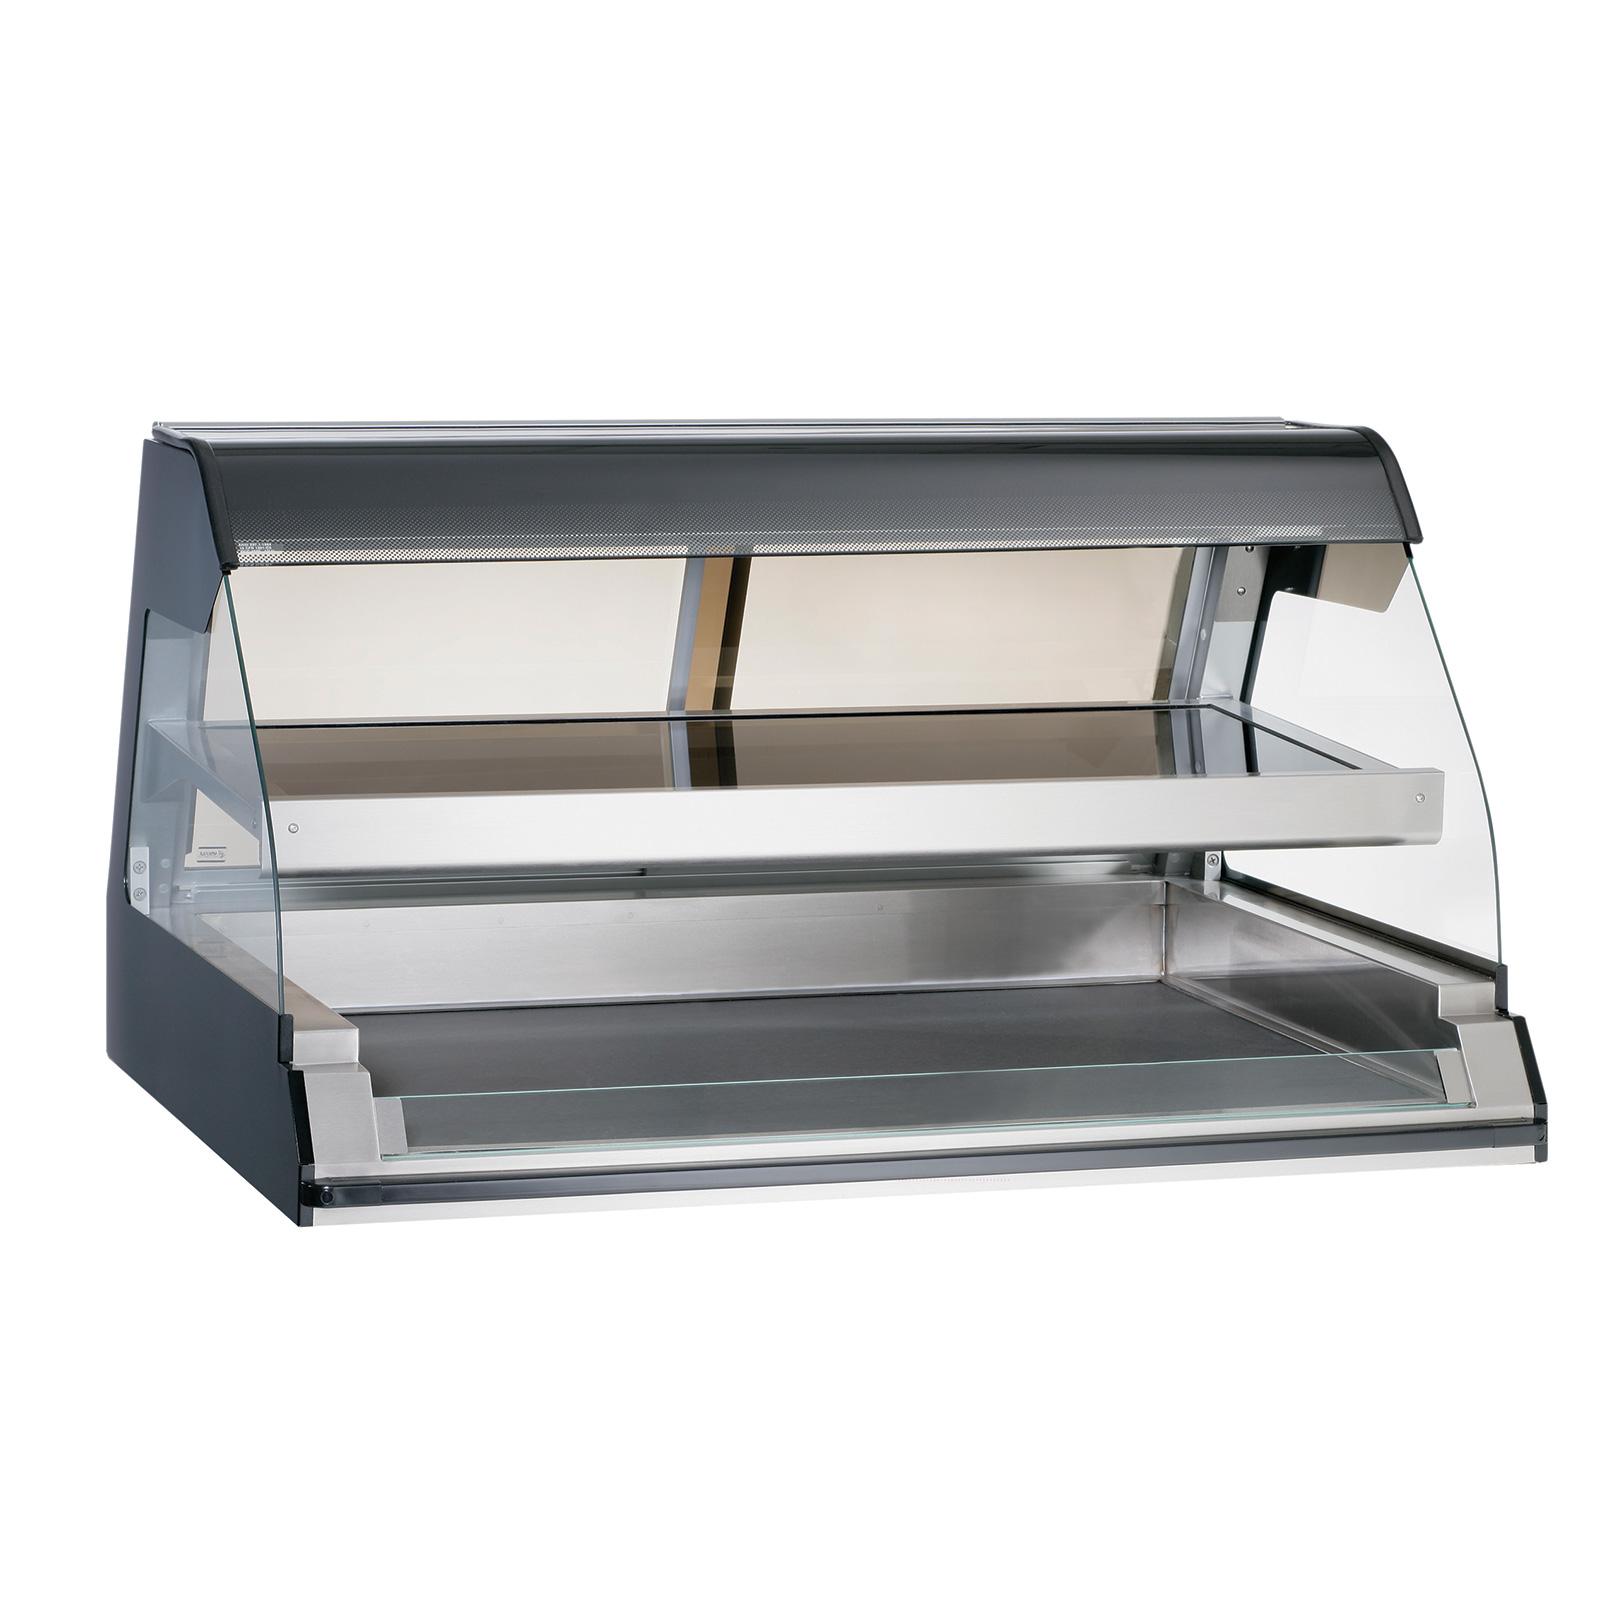 Alto-Shaam ED2-48/2S-BLK display case, heated deli, countertop